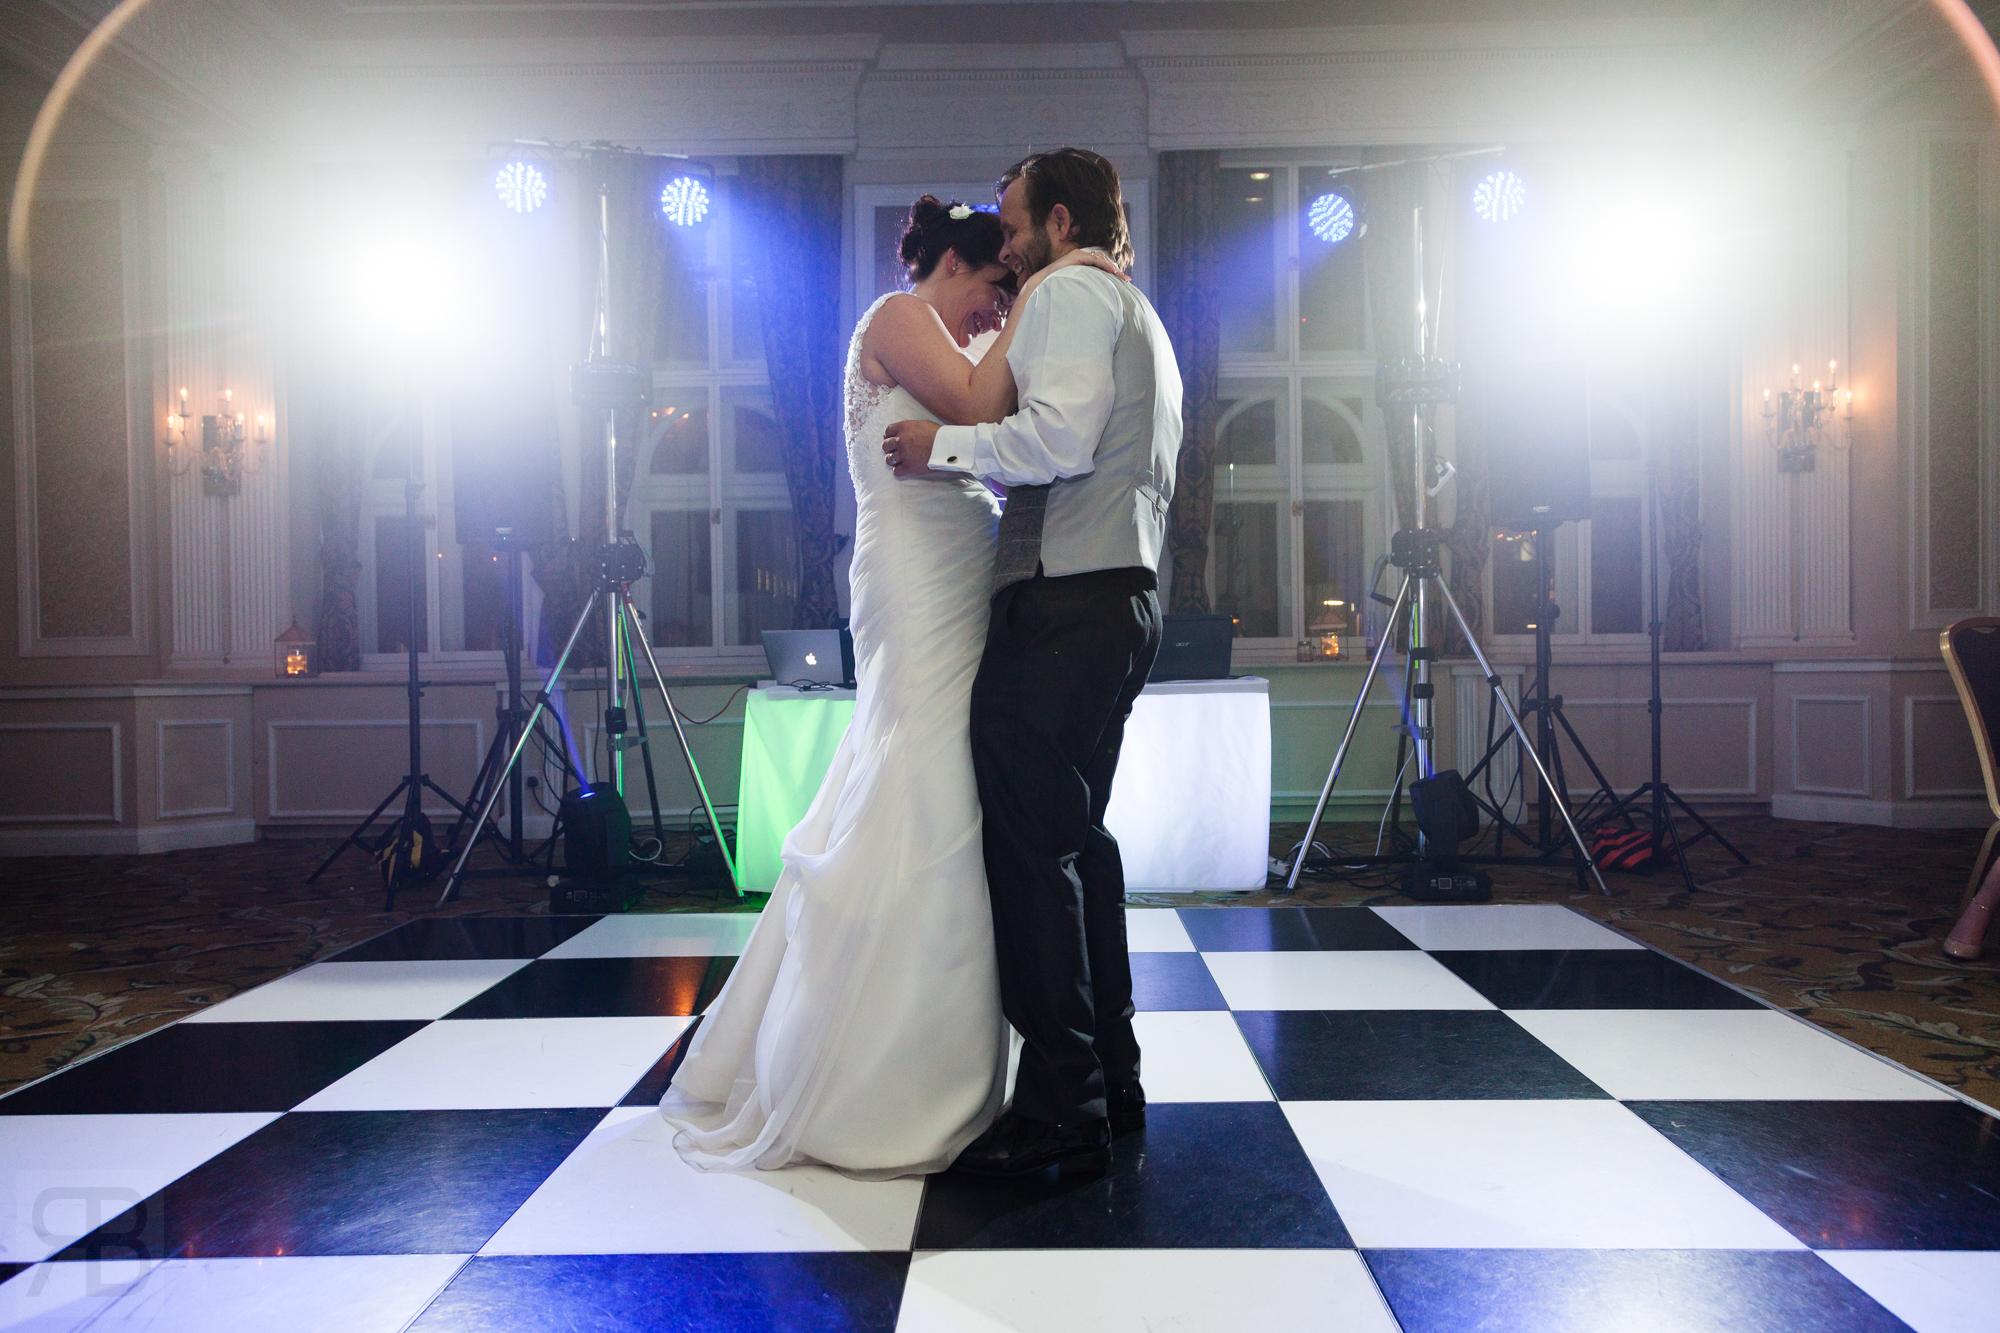 Mr & Mrs Charnock - Wedding Day 14th Oct 2017